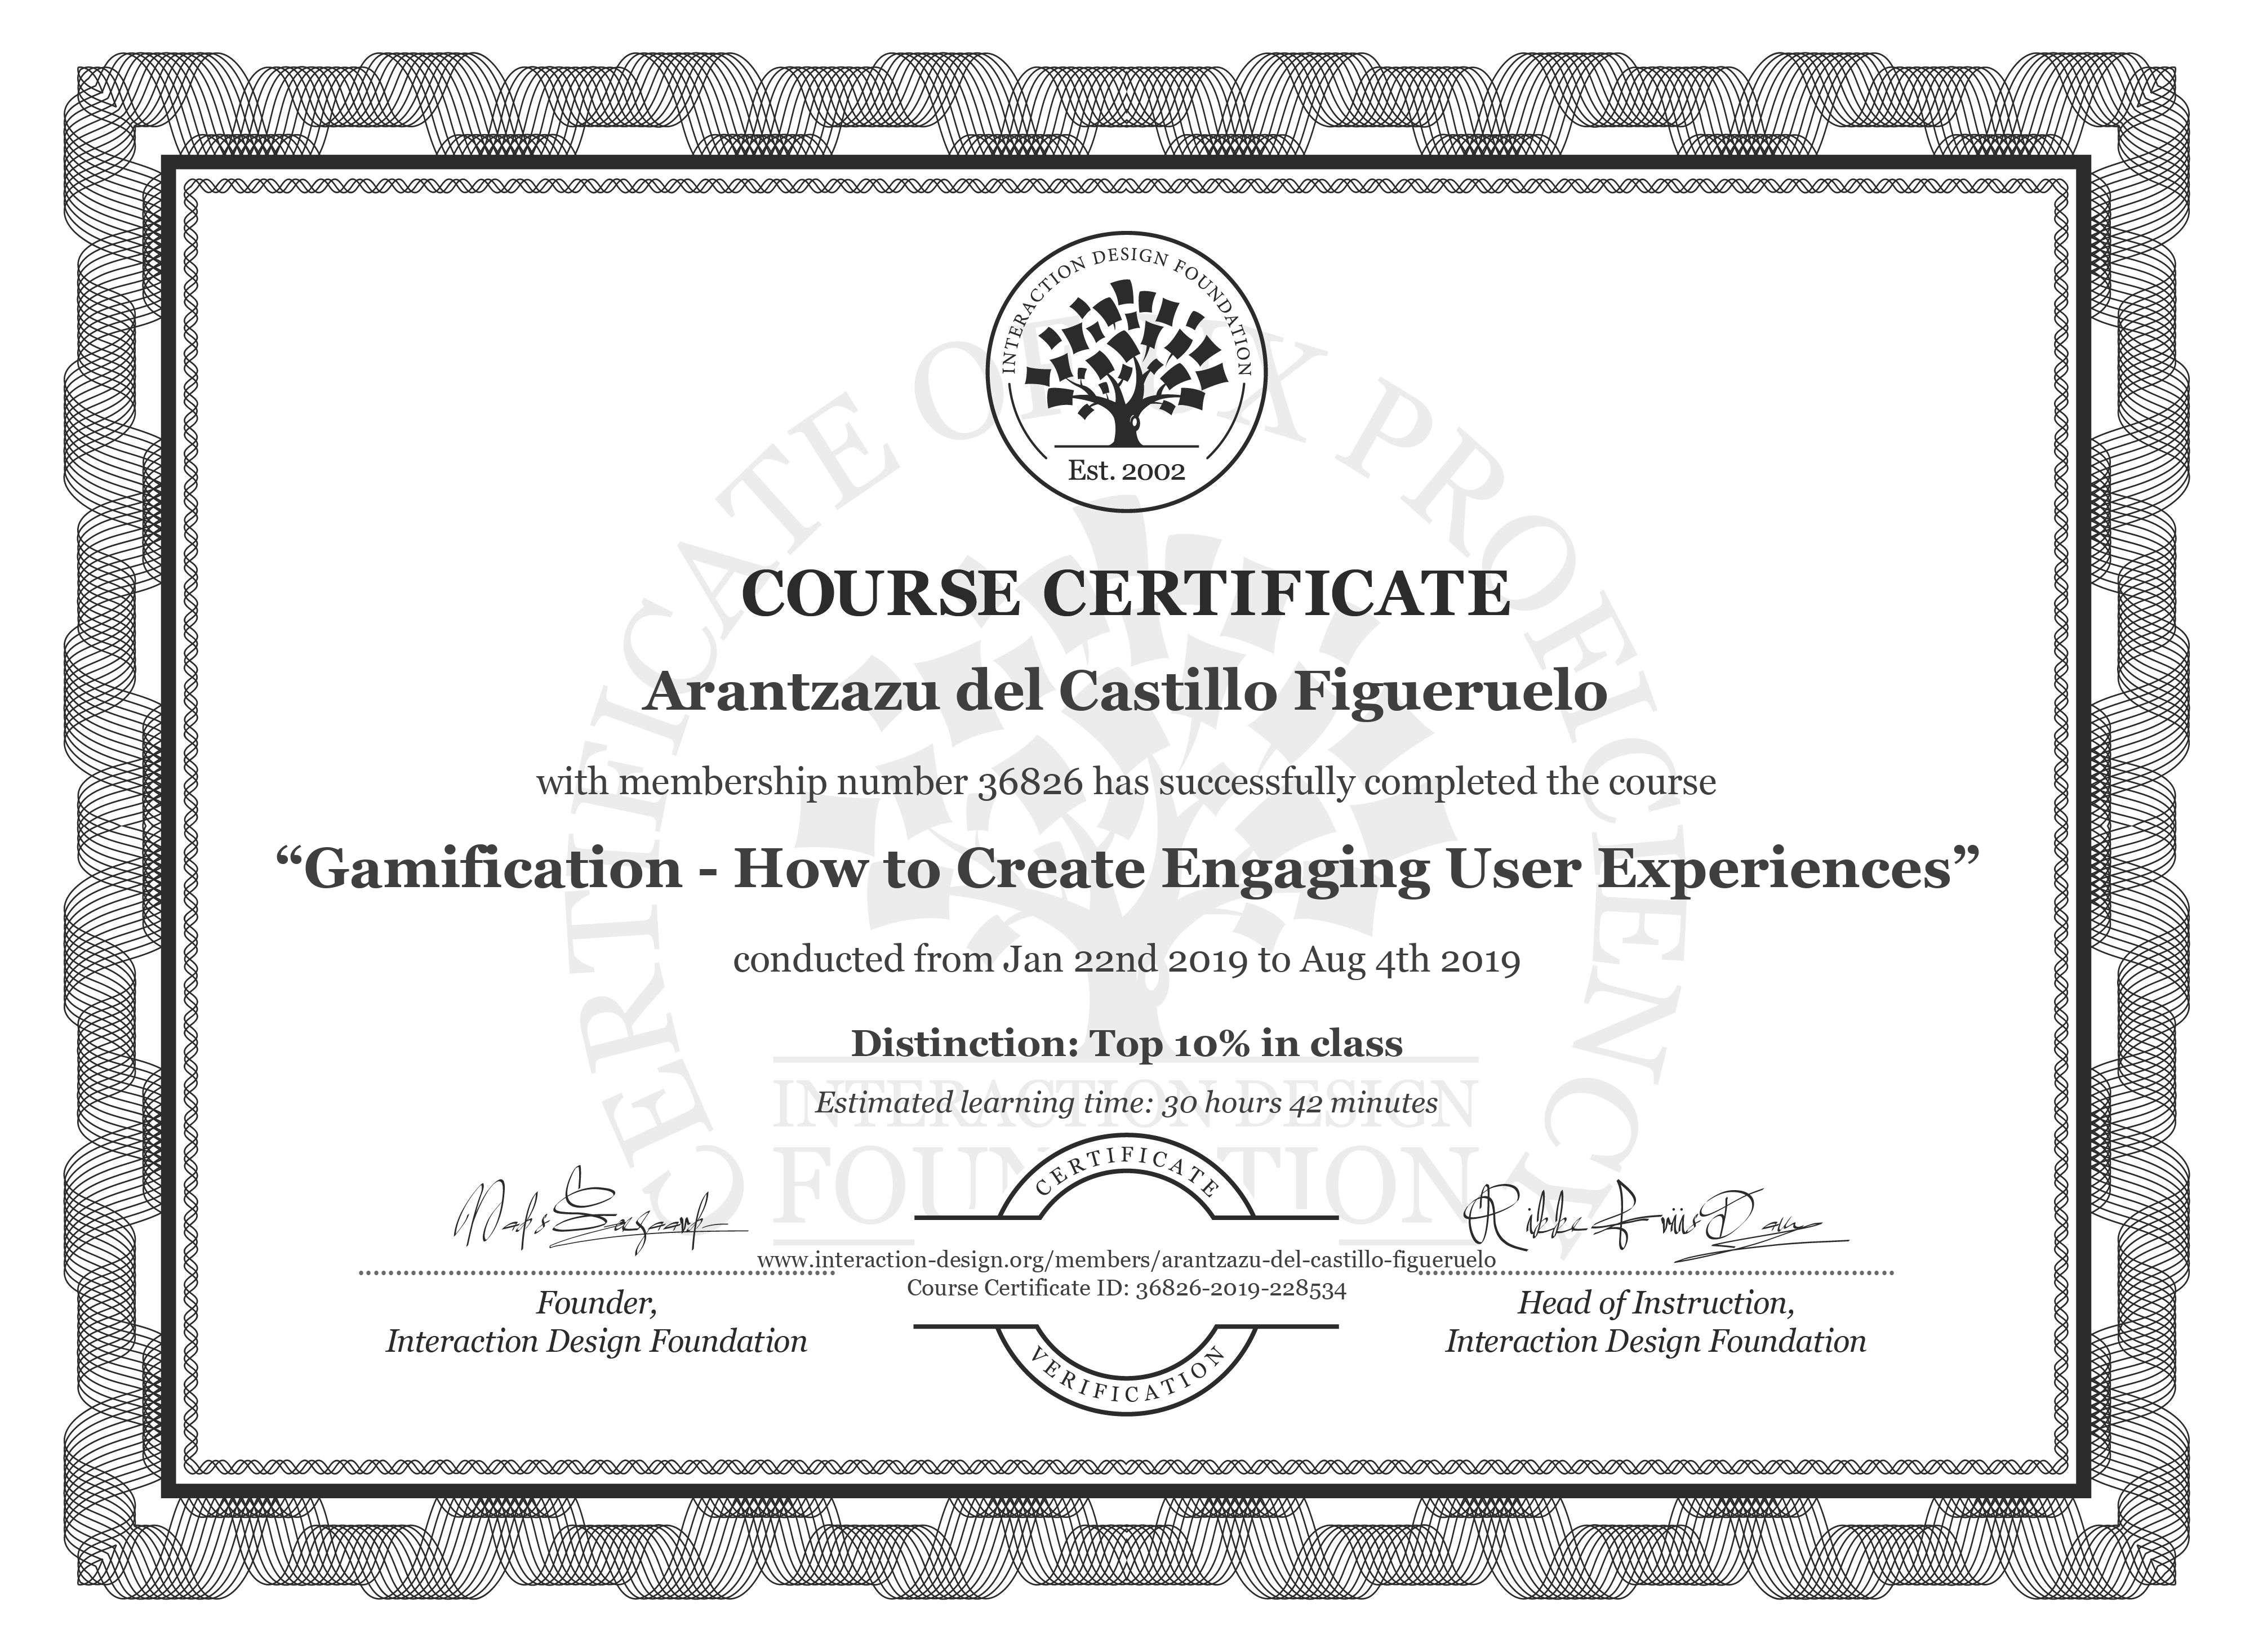 Arantzazu del Castillo Figueruelo's Course Certificate: Gamification – Creating Addictive User Experiences